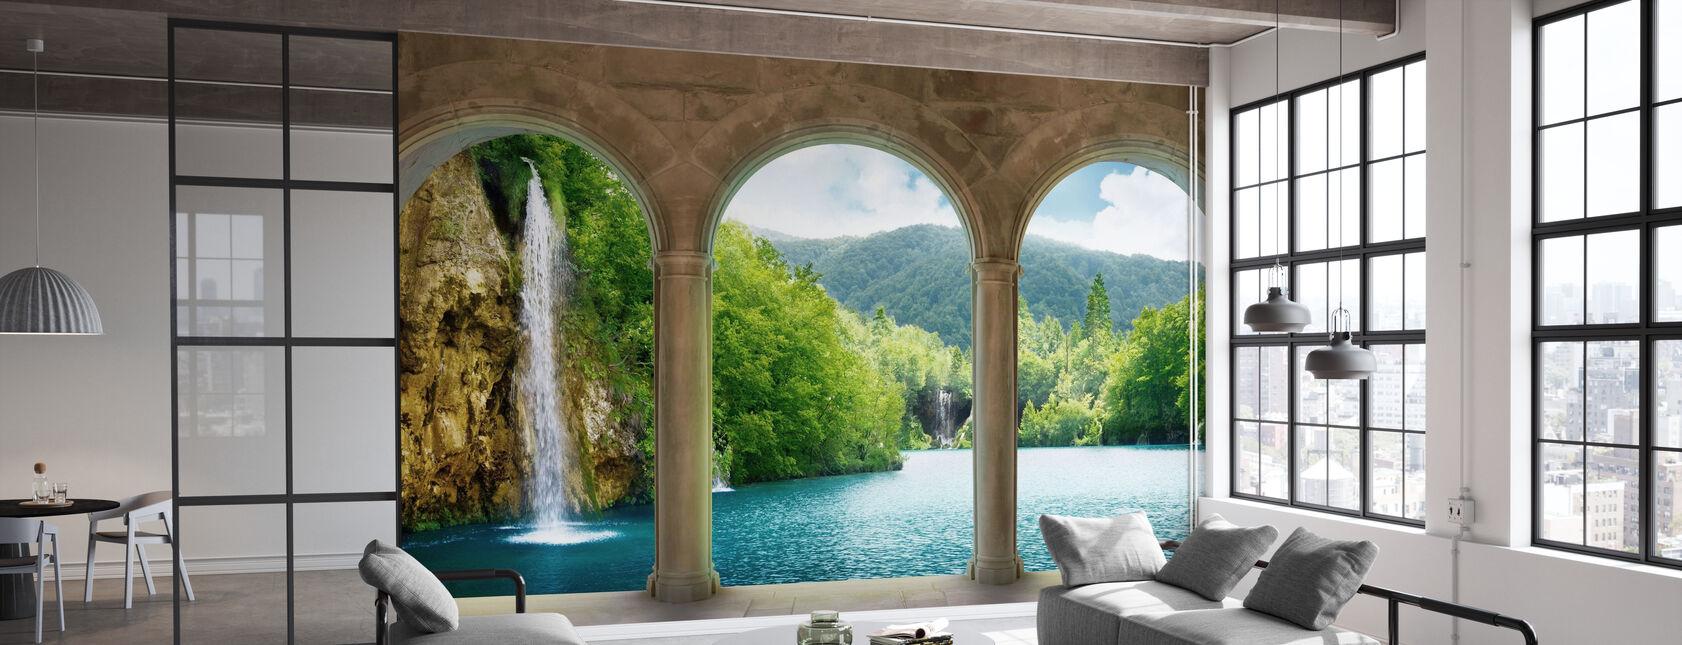 Waterfall behind Vault - Wallpaper - Office